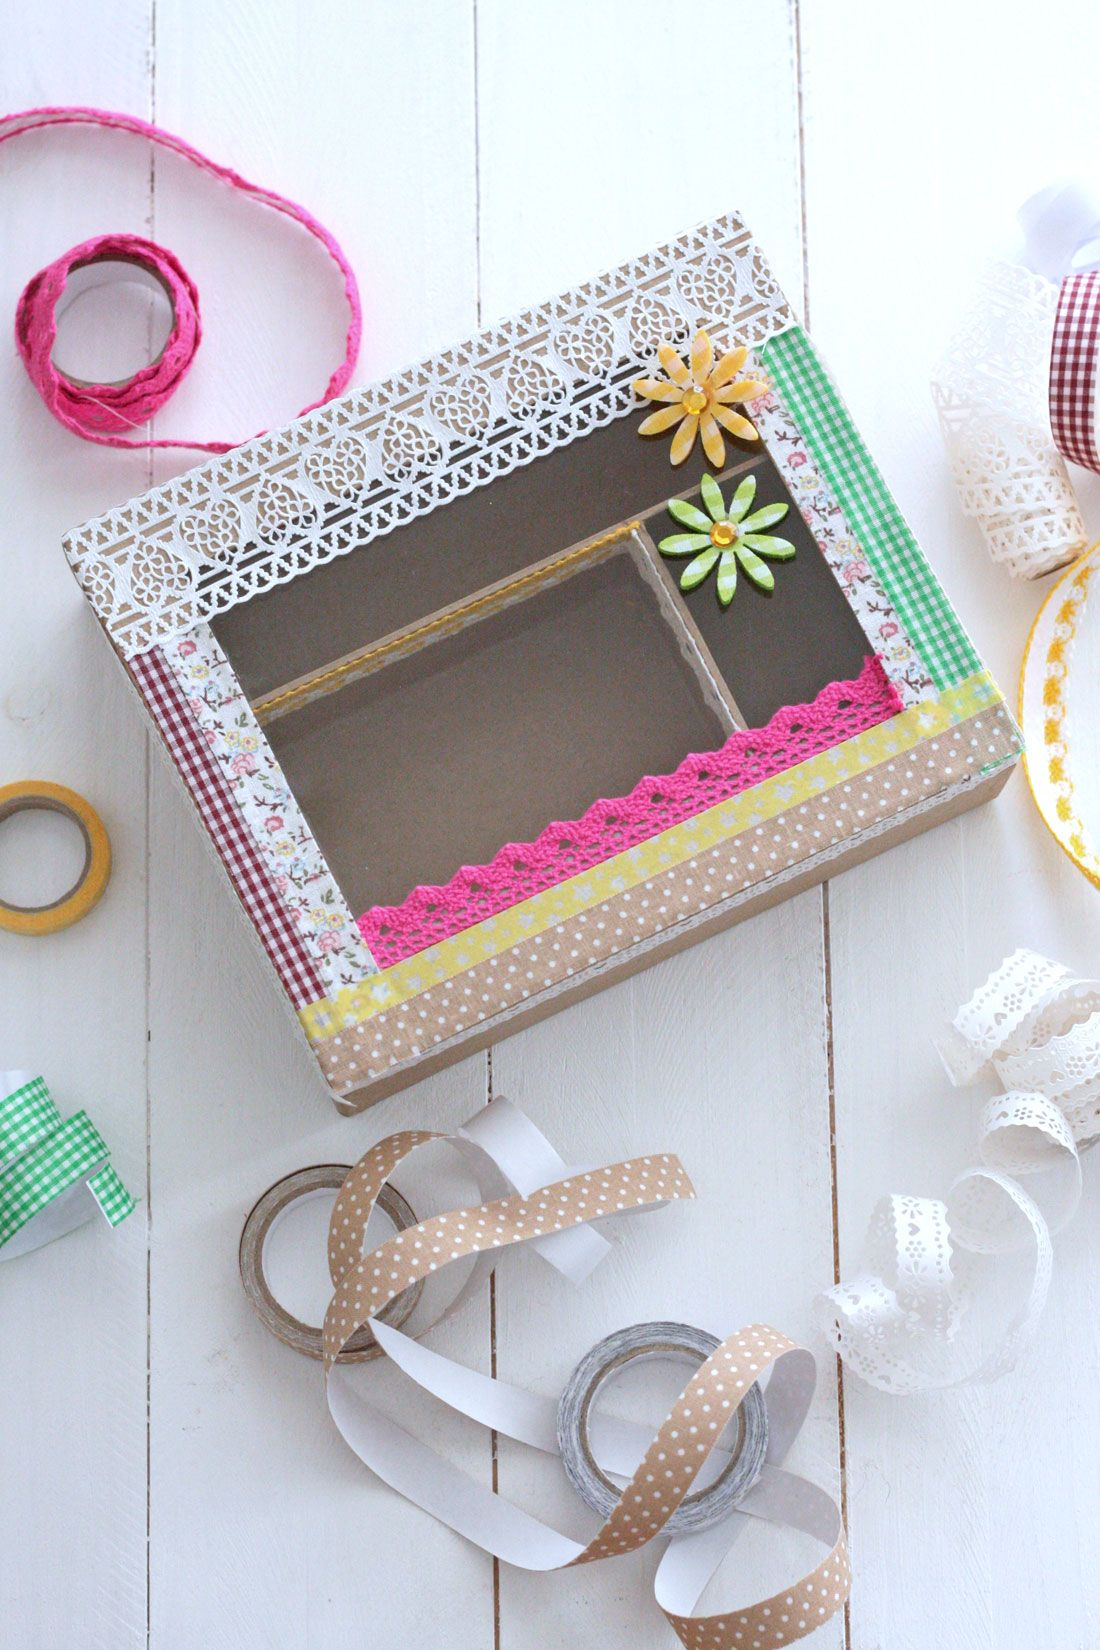 Caja decorada con washi tape cajas decoradas - Cajas carton decoradas ...